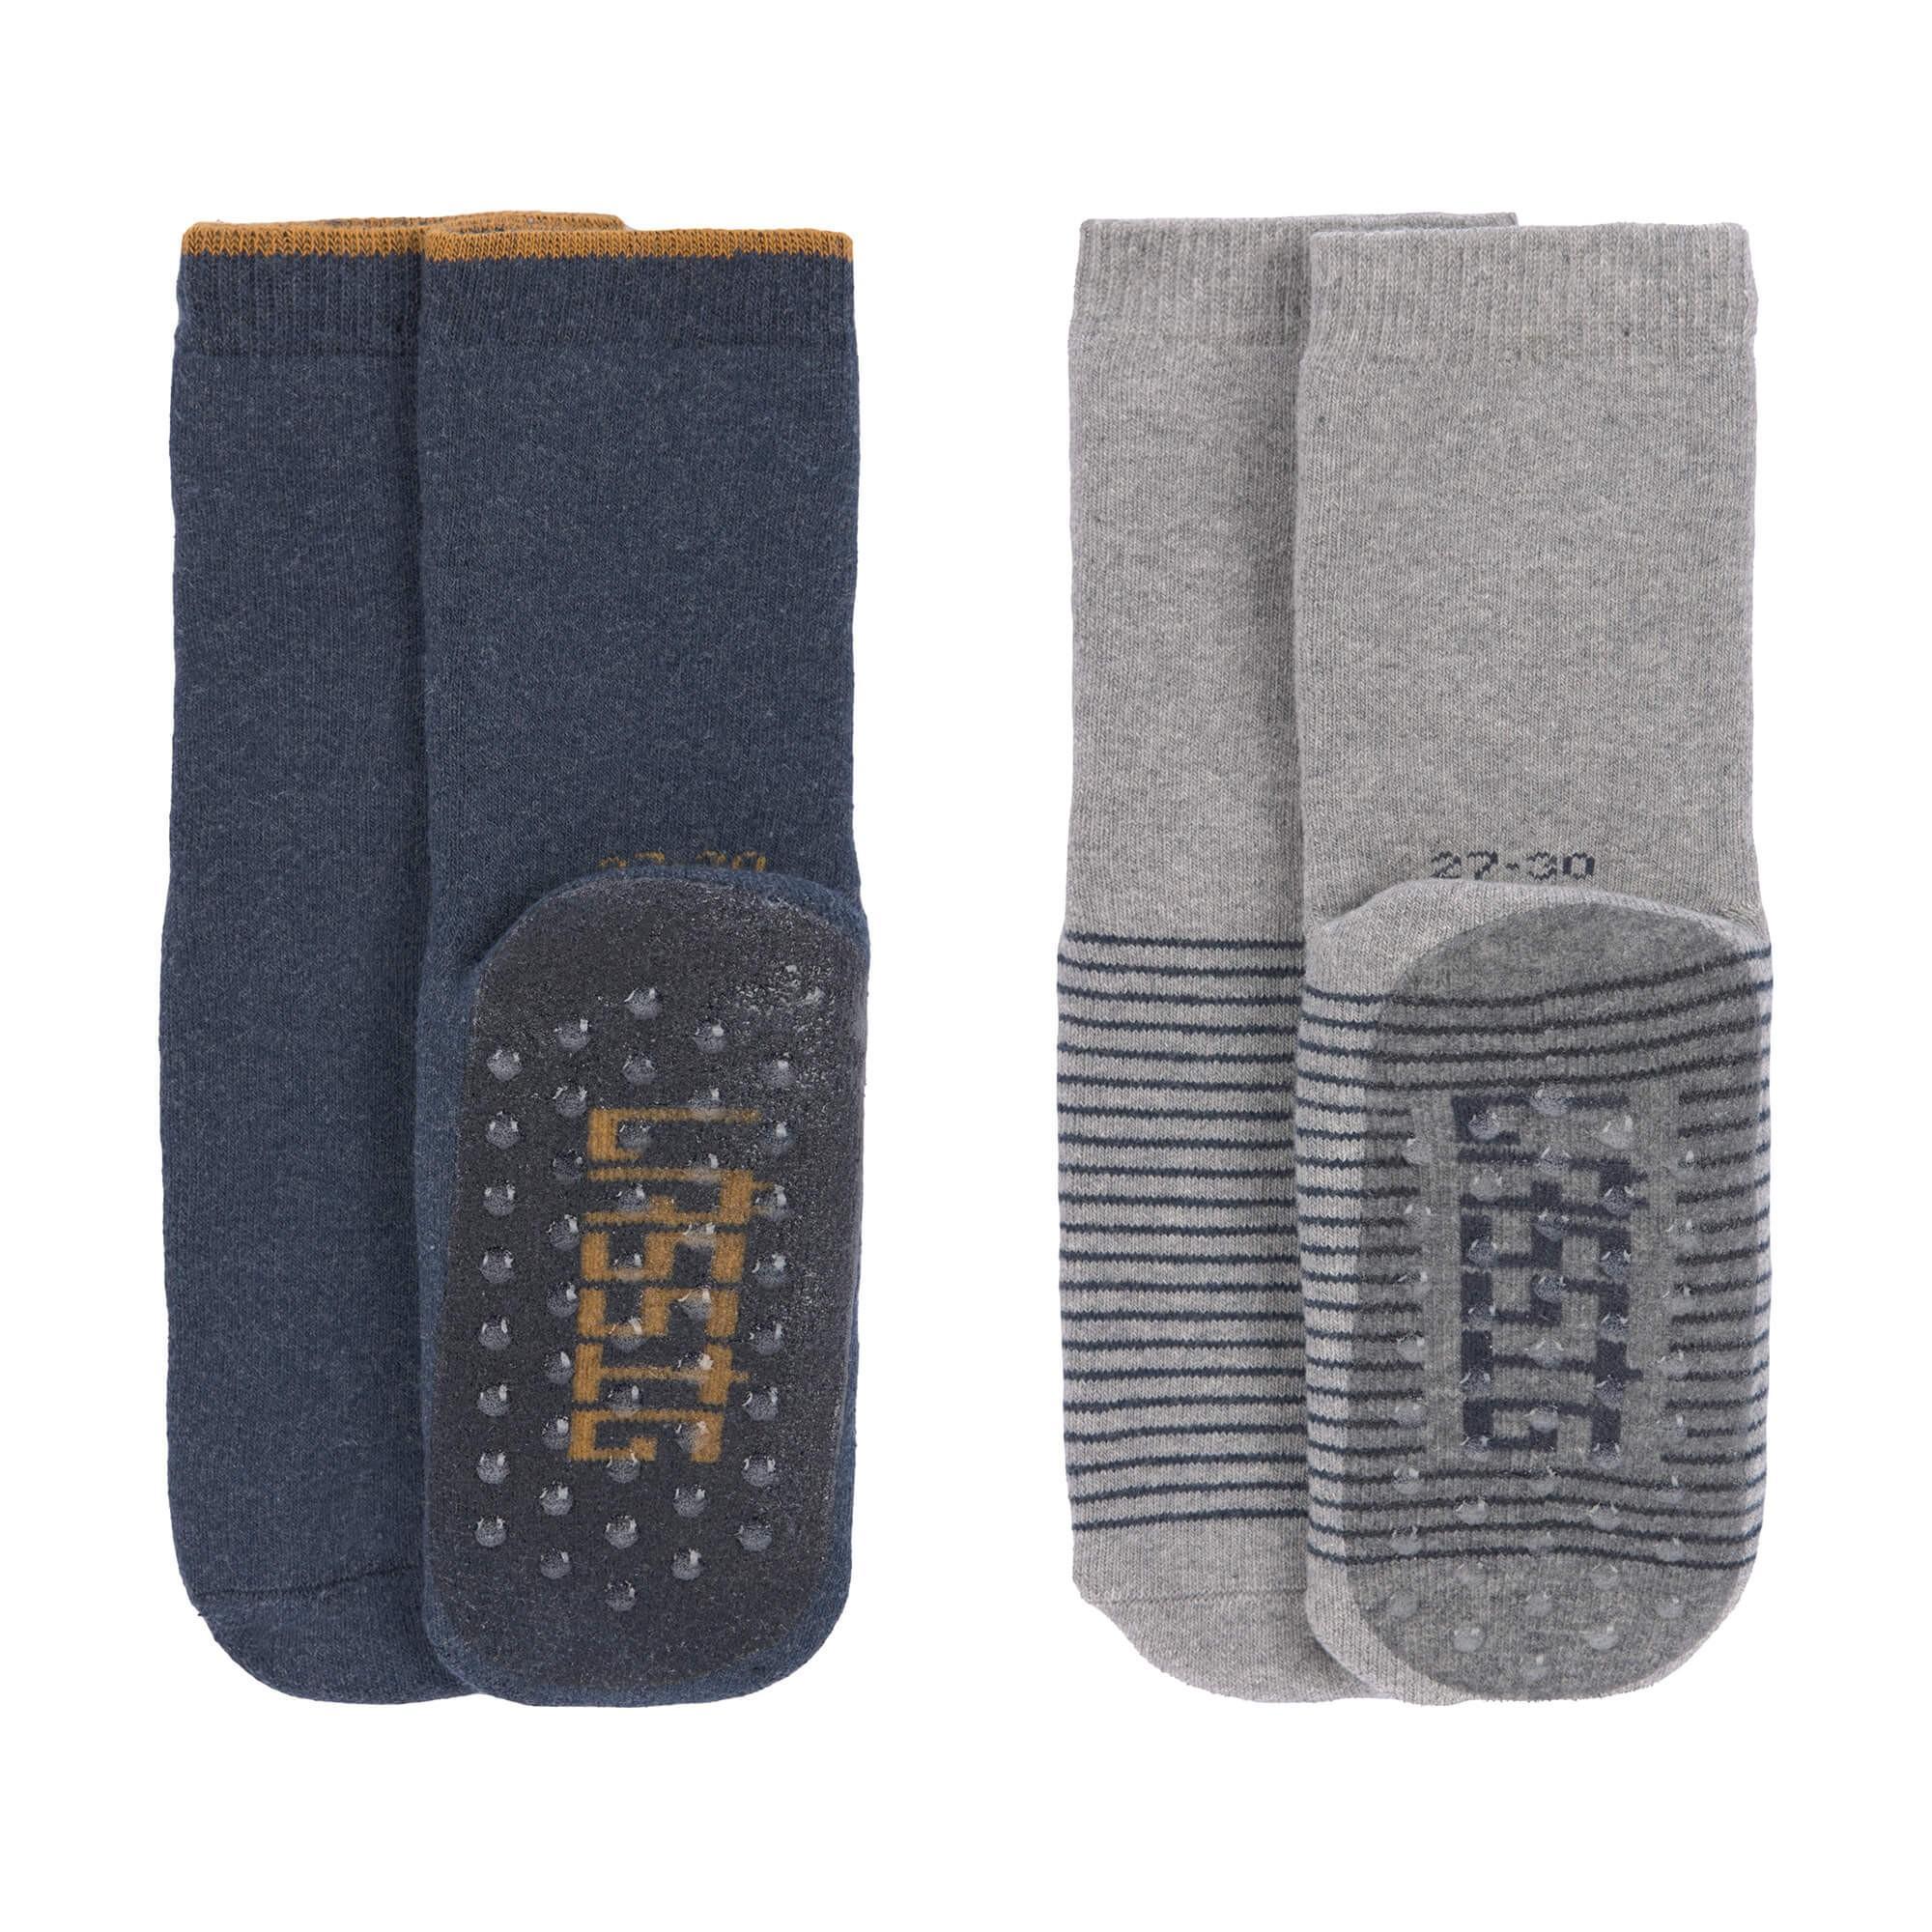 Lassig - Anti-slip Socks 2 pcs. assorted blue/grey, Size: 23-26